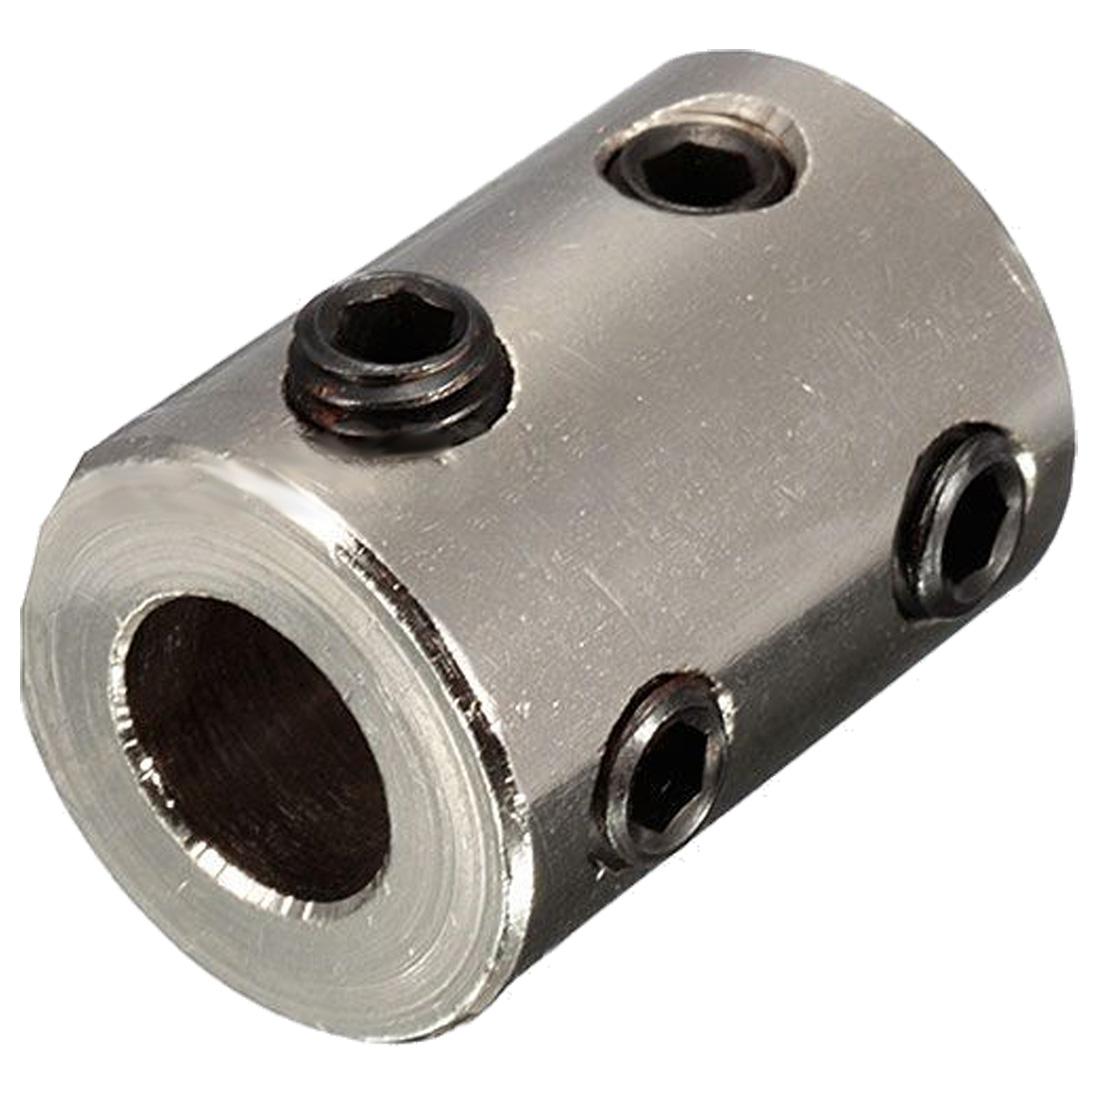 Coupling rigid shaft coupling coupler tighten screw for Stepper motor shaft coupling coupler